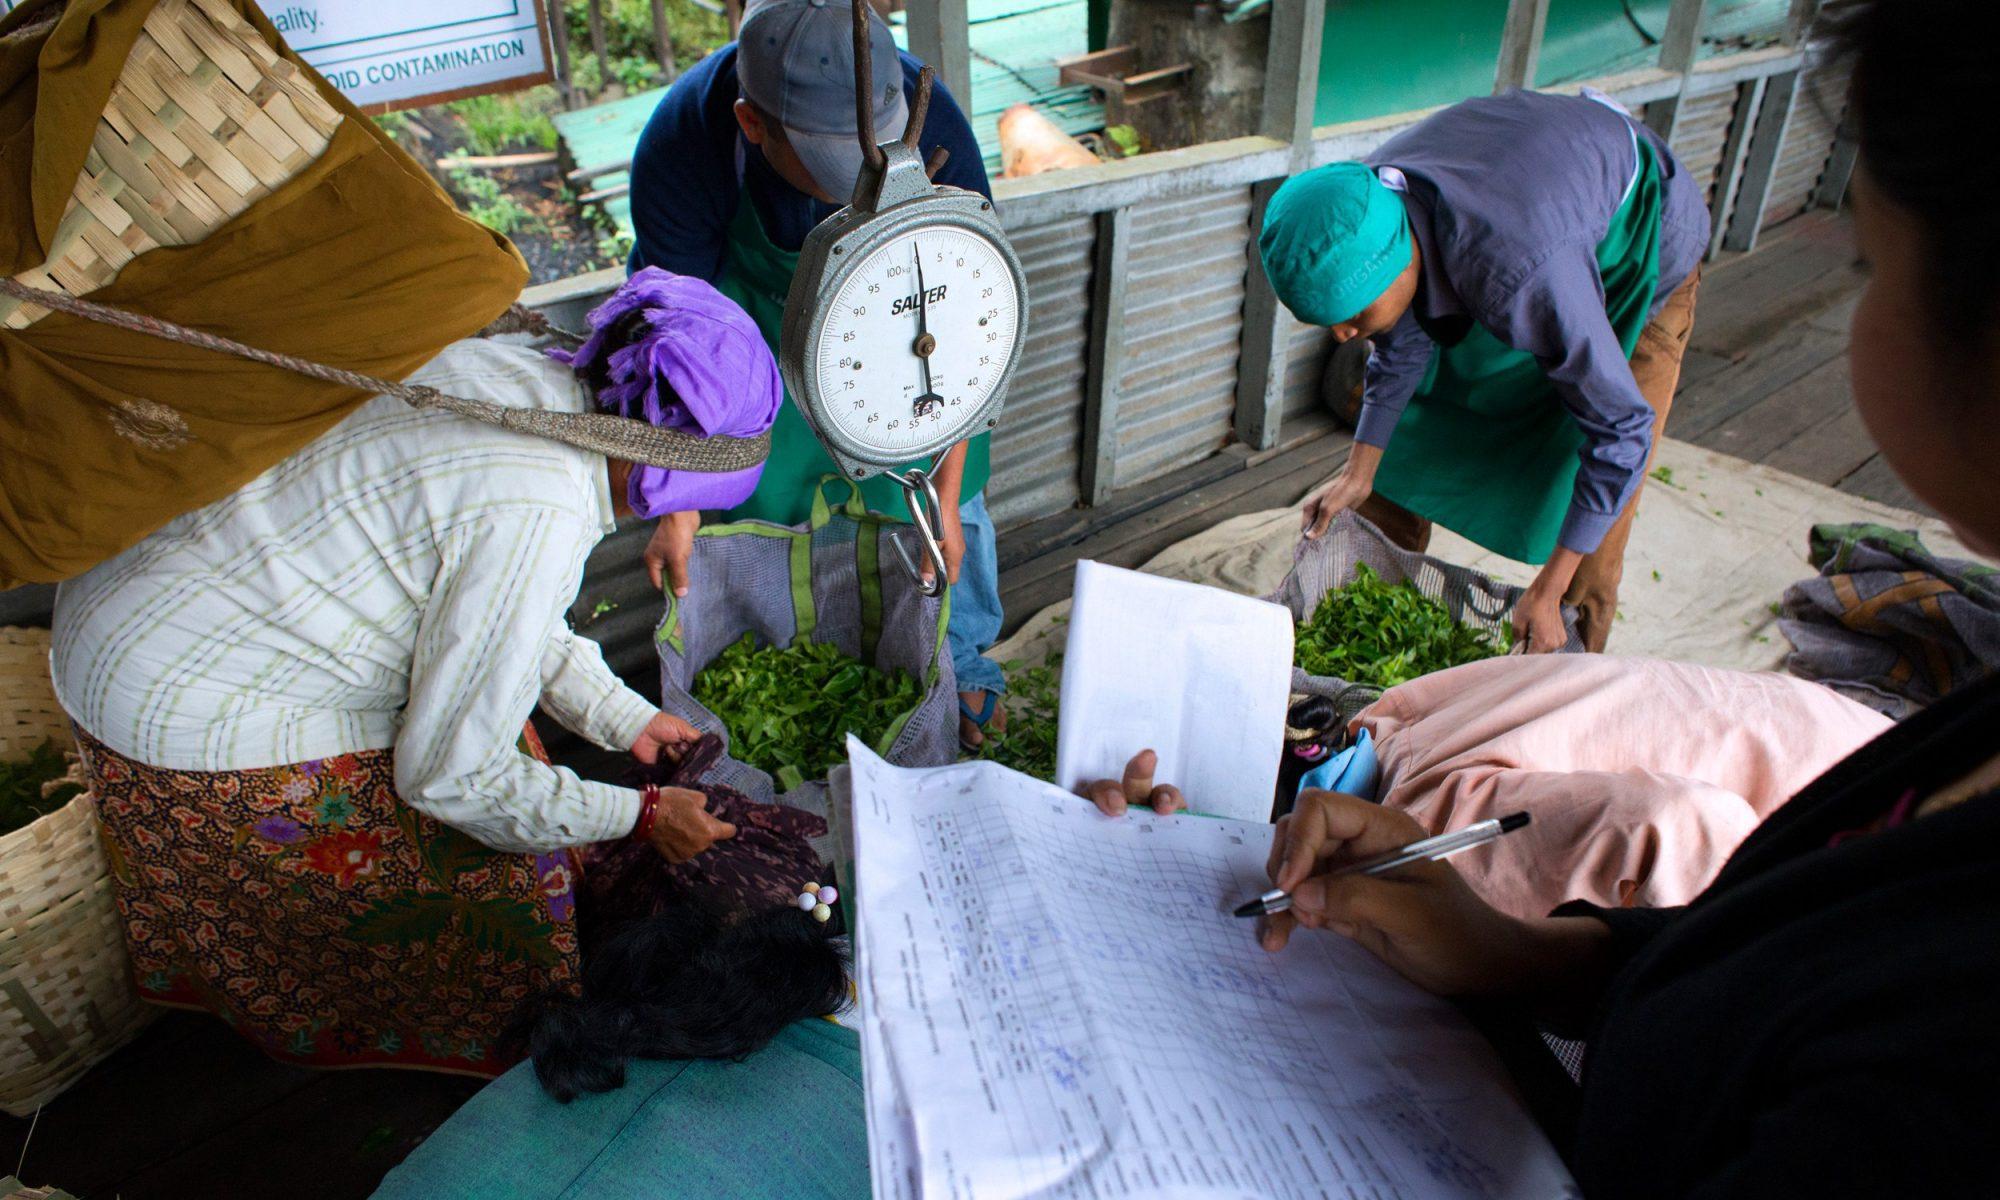 EC: Darjeeling Tea Shortage Looms in the United Kingdom